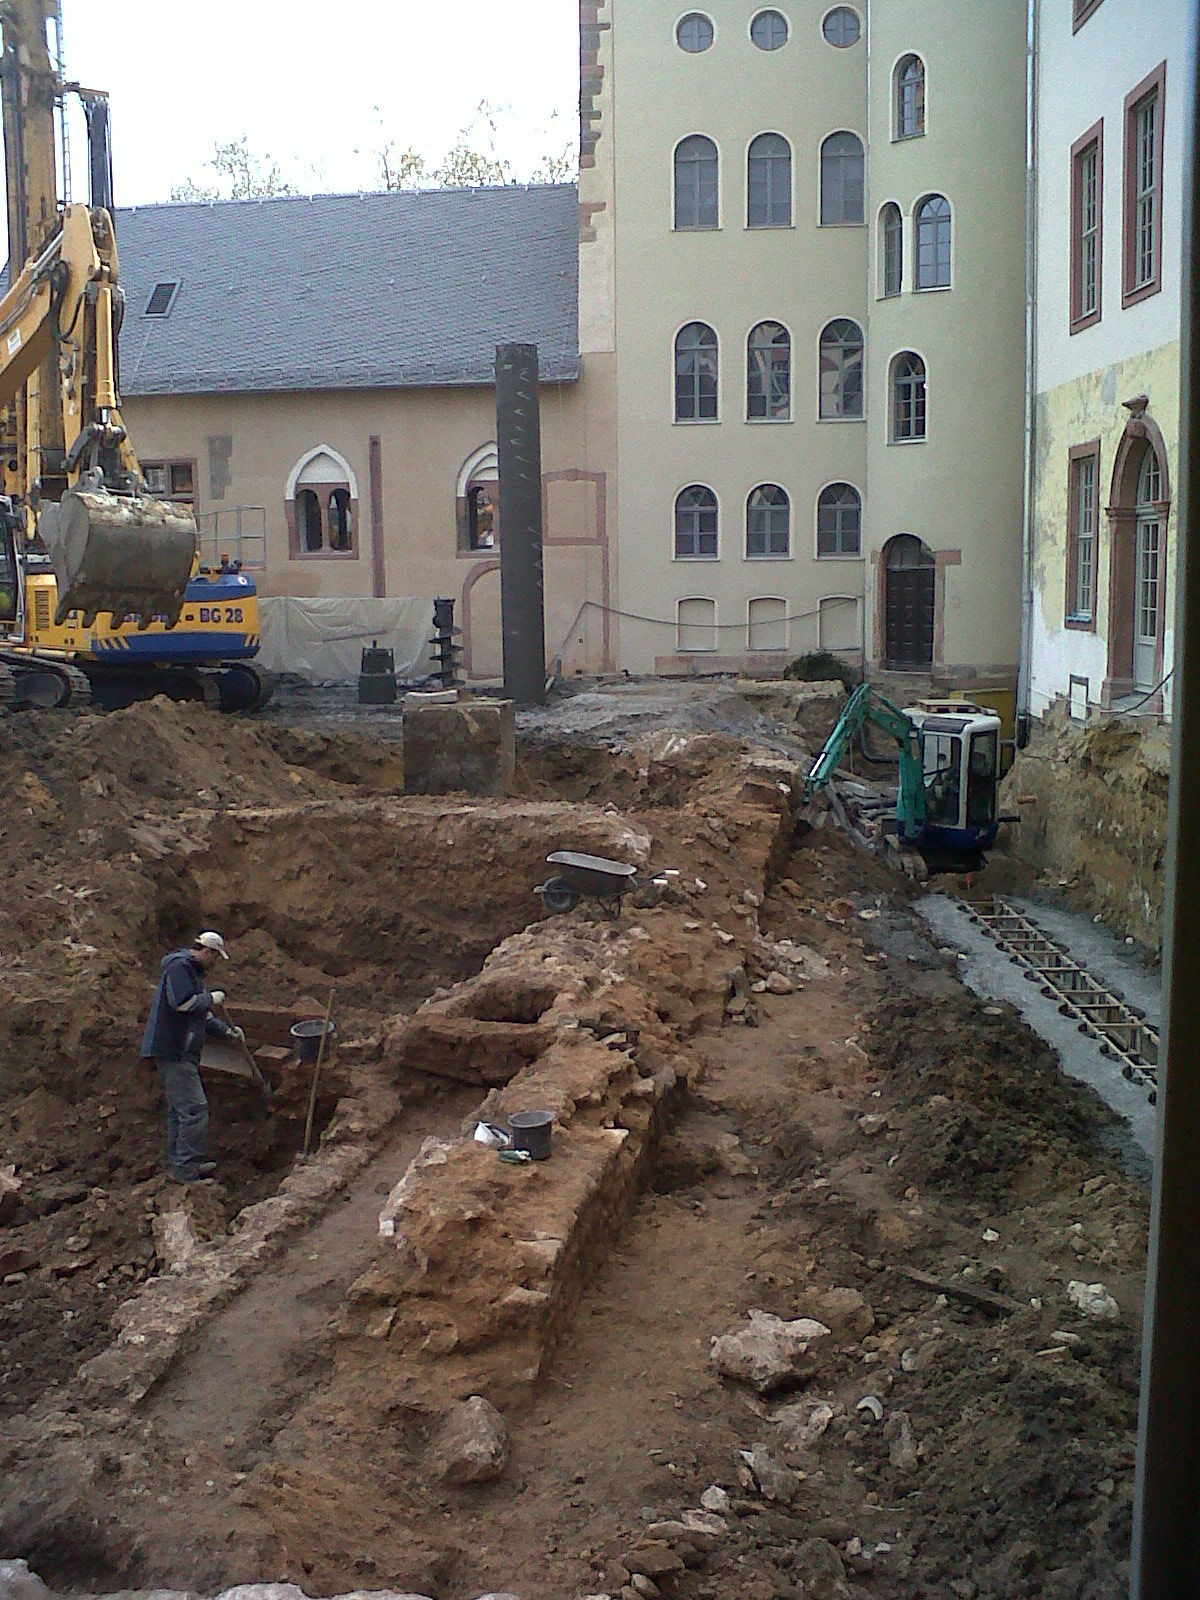 historisches museum frankfurt – Baugrube